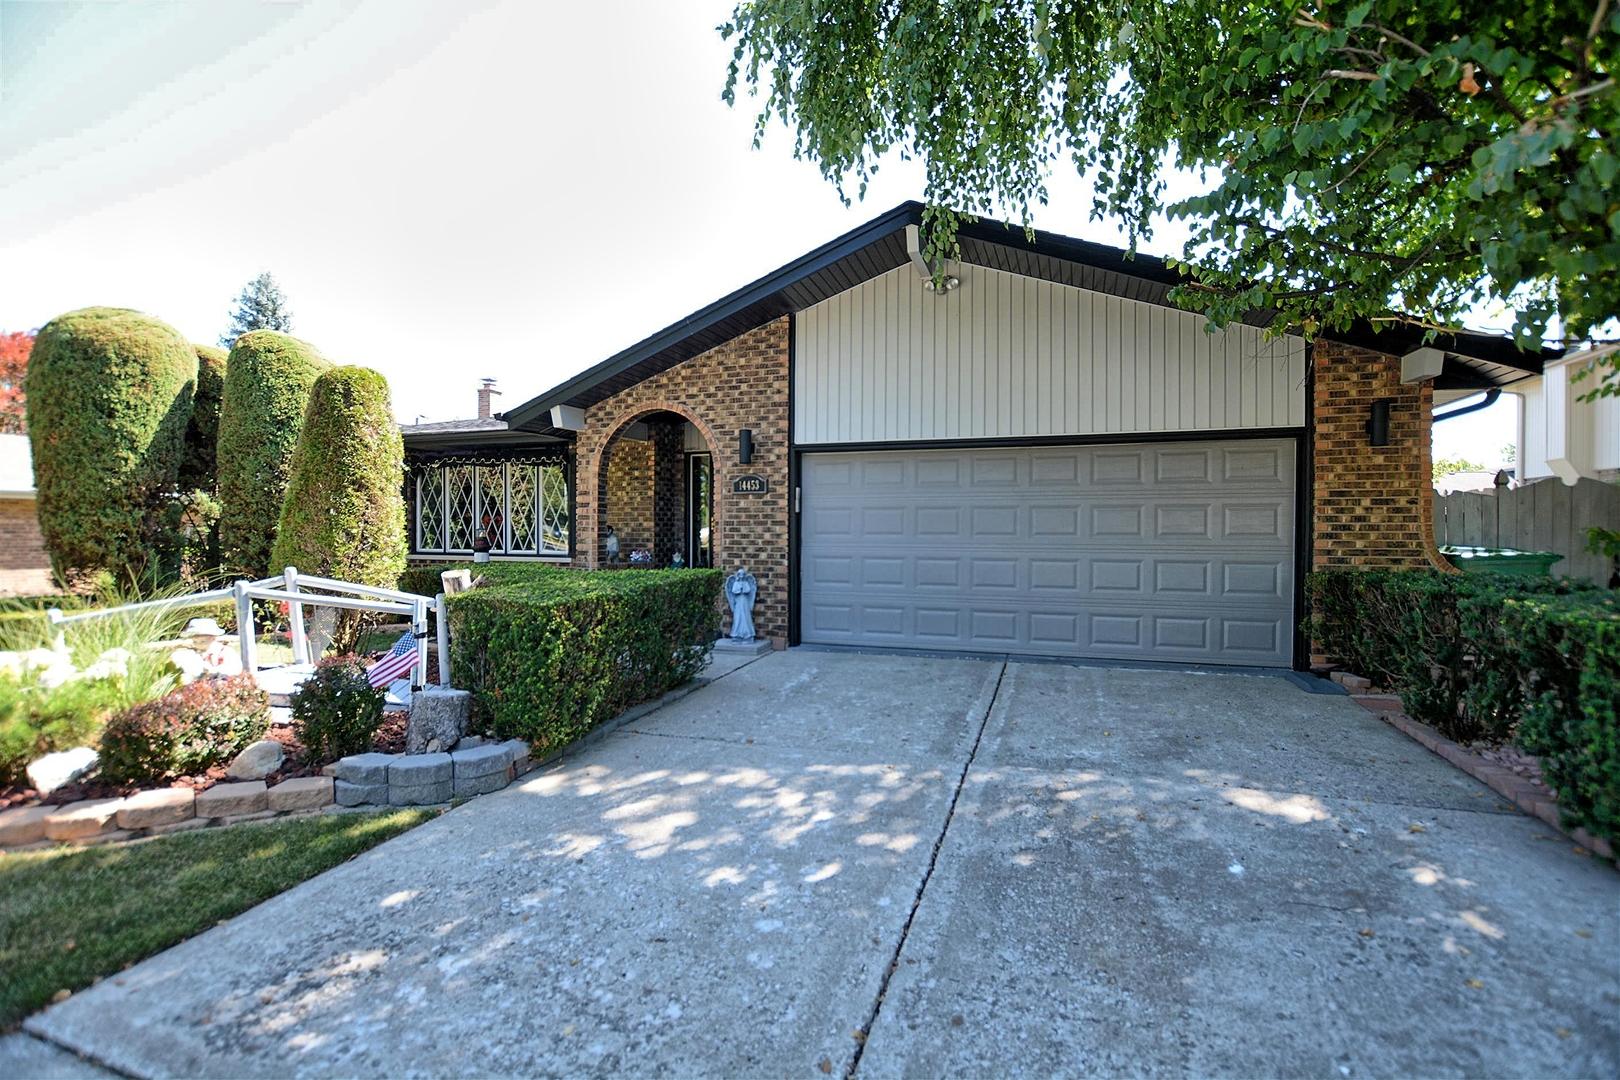 14453 South Mallard Lane 60491 - One of Homer Glen Homes for Sale